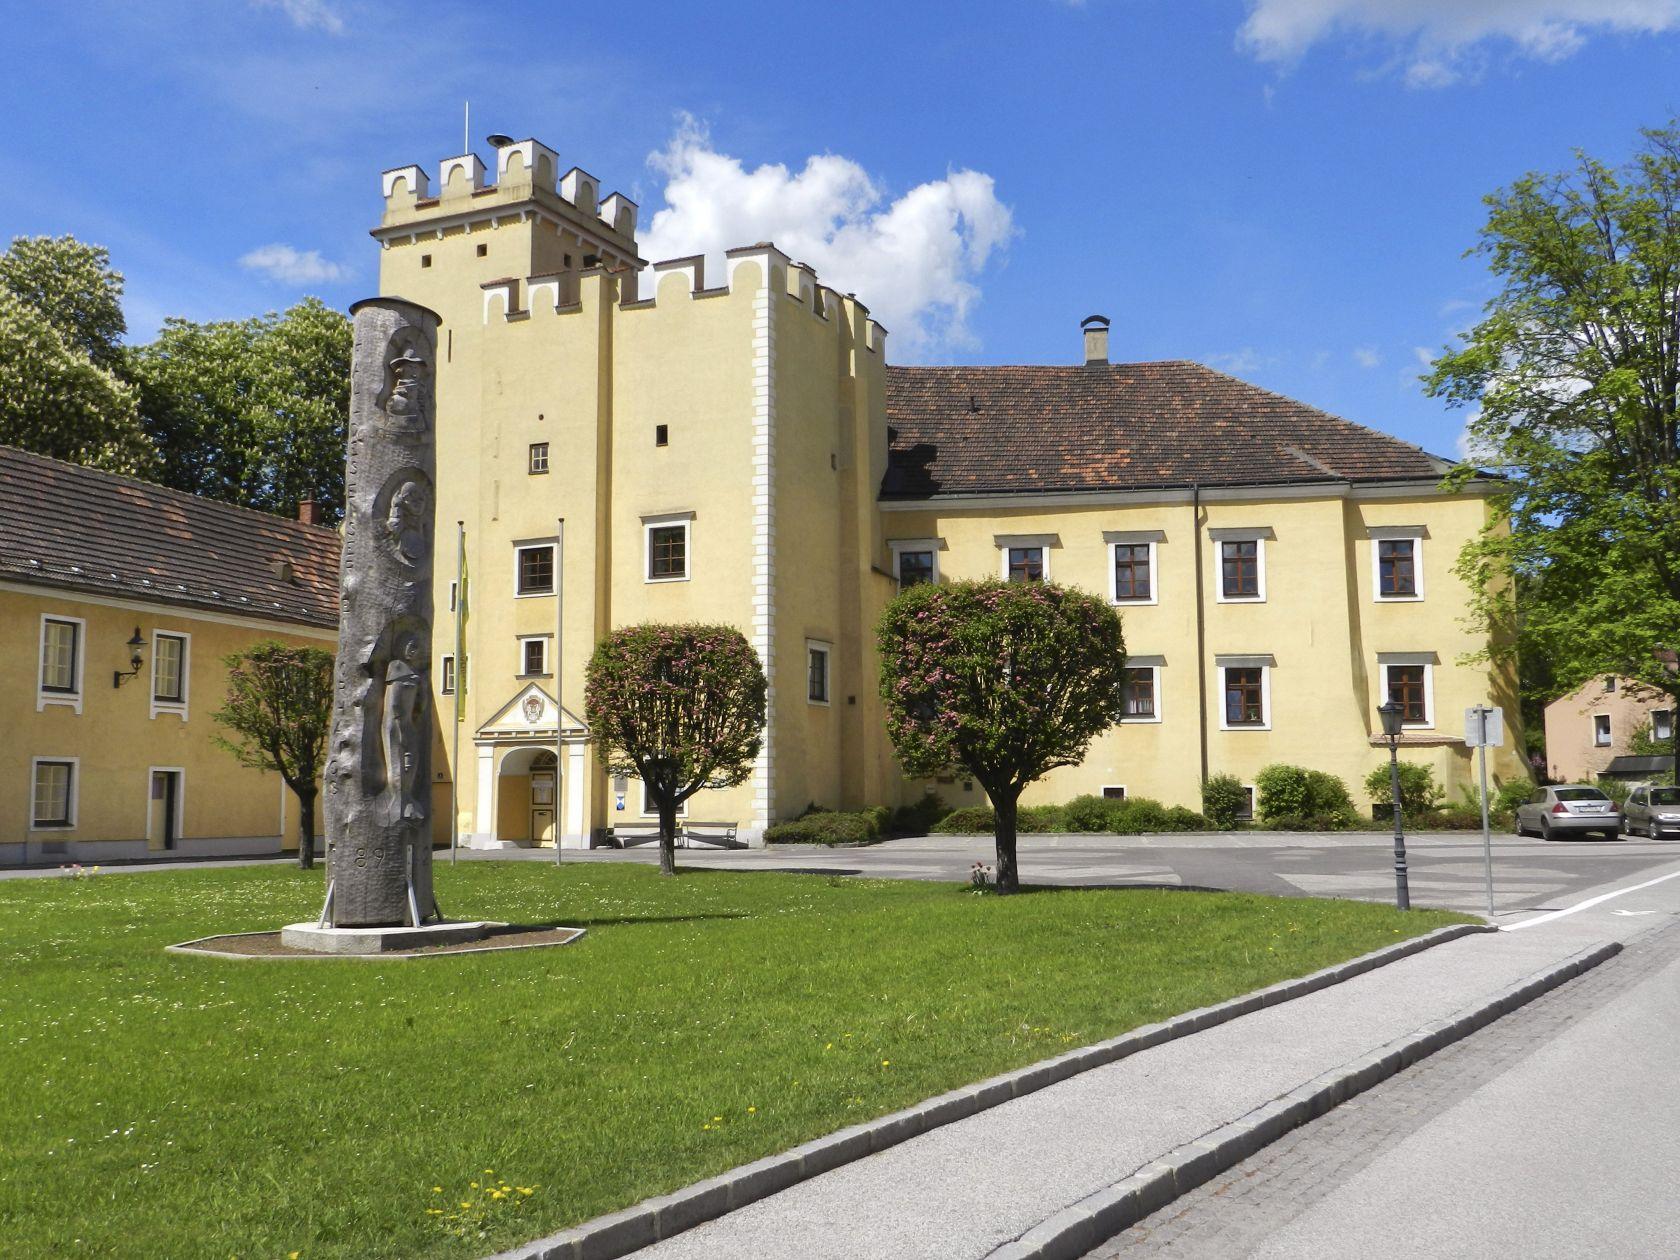 Thayarunde-Schloss Groß-Siegharts